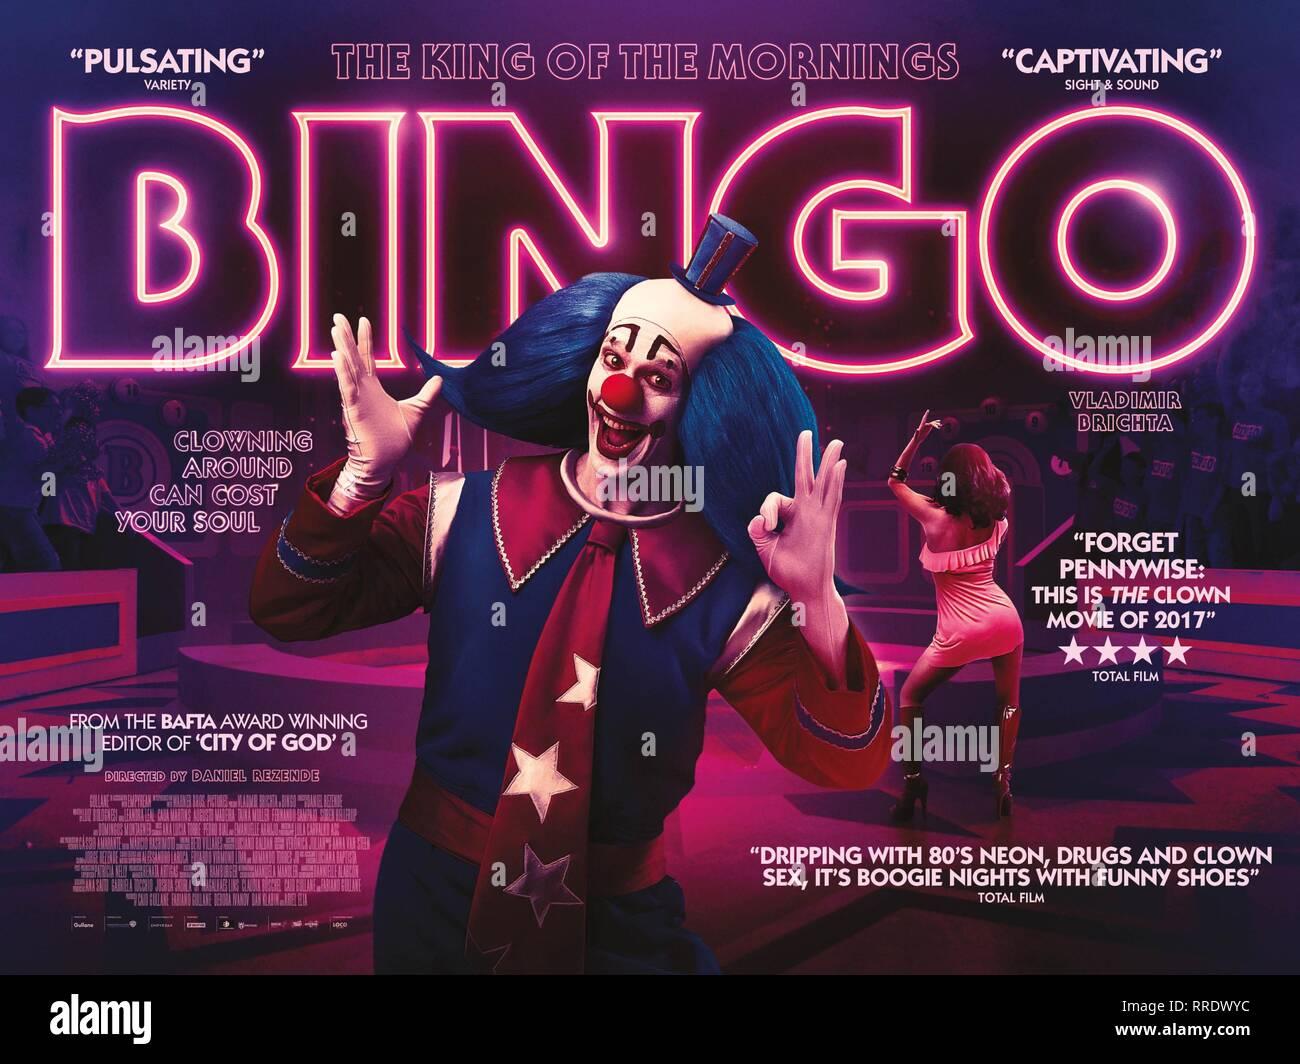 BINGO: THE KING OF THE MORNINGS, VLADIMIR BRICHTA POSTER, 2017 - Stock Image